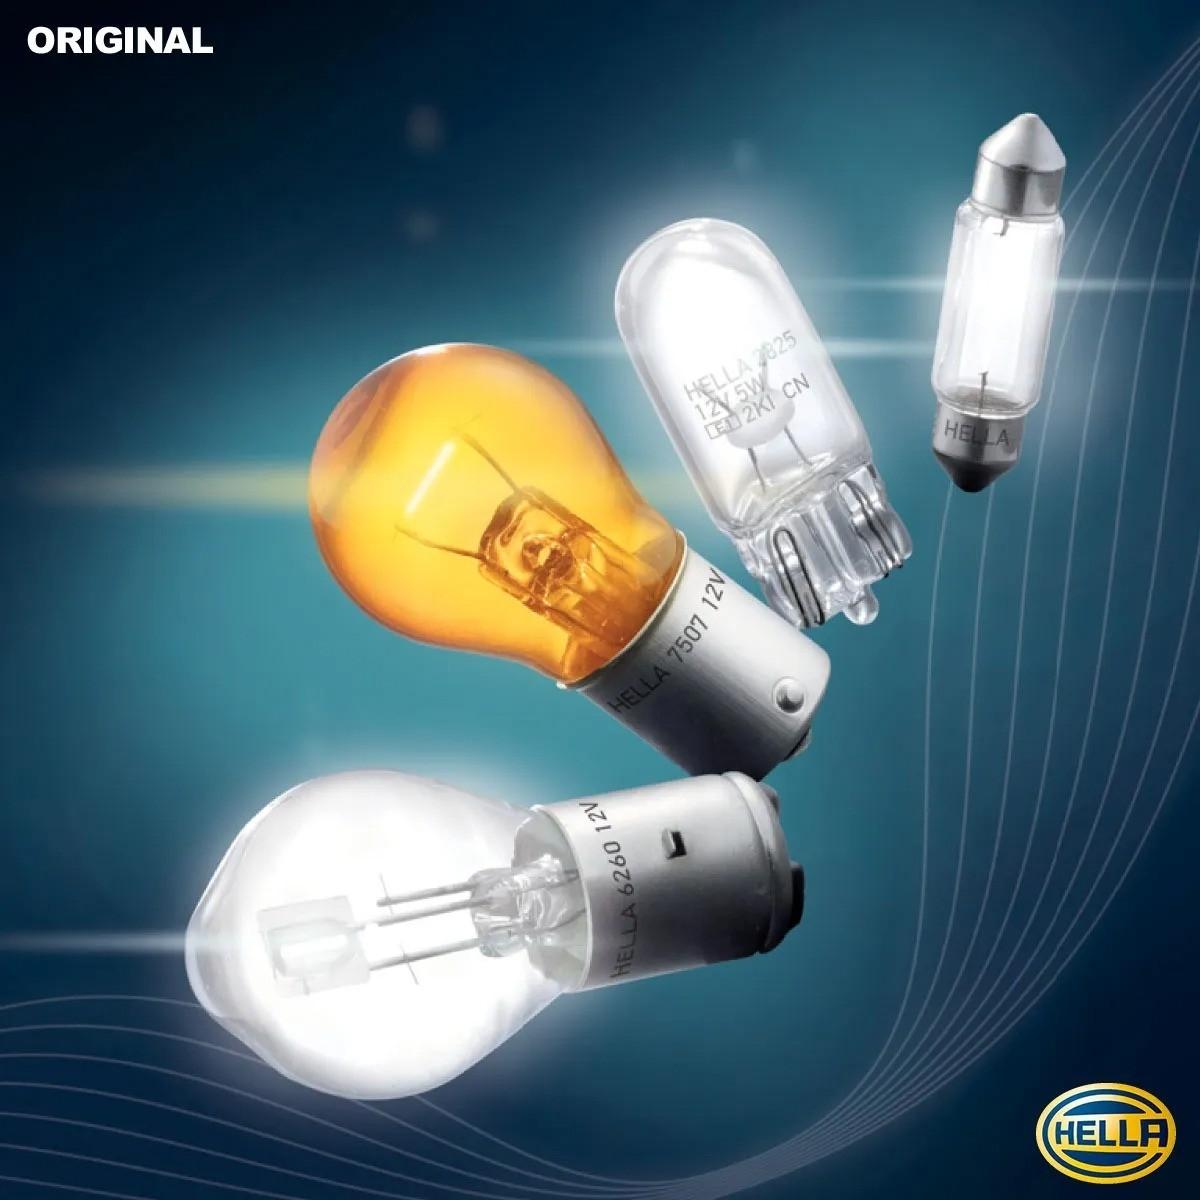 LAMPADA CONVENCIONAL 12V 12V 55W FAROL HB4 UNIVERSAL HELLA